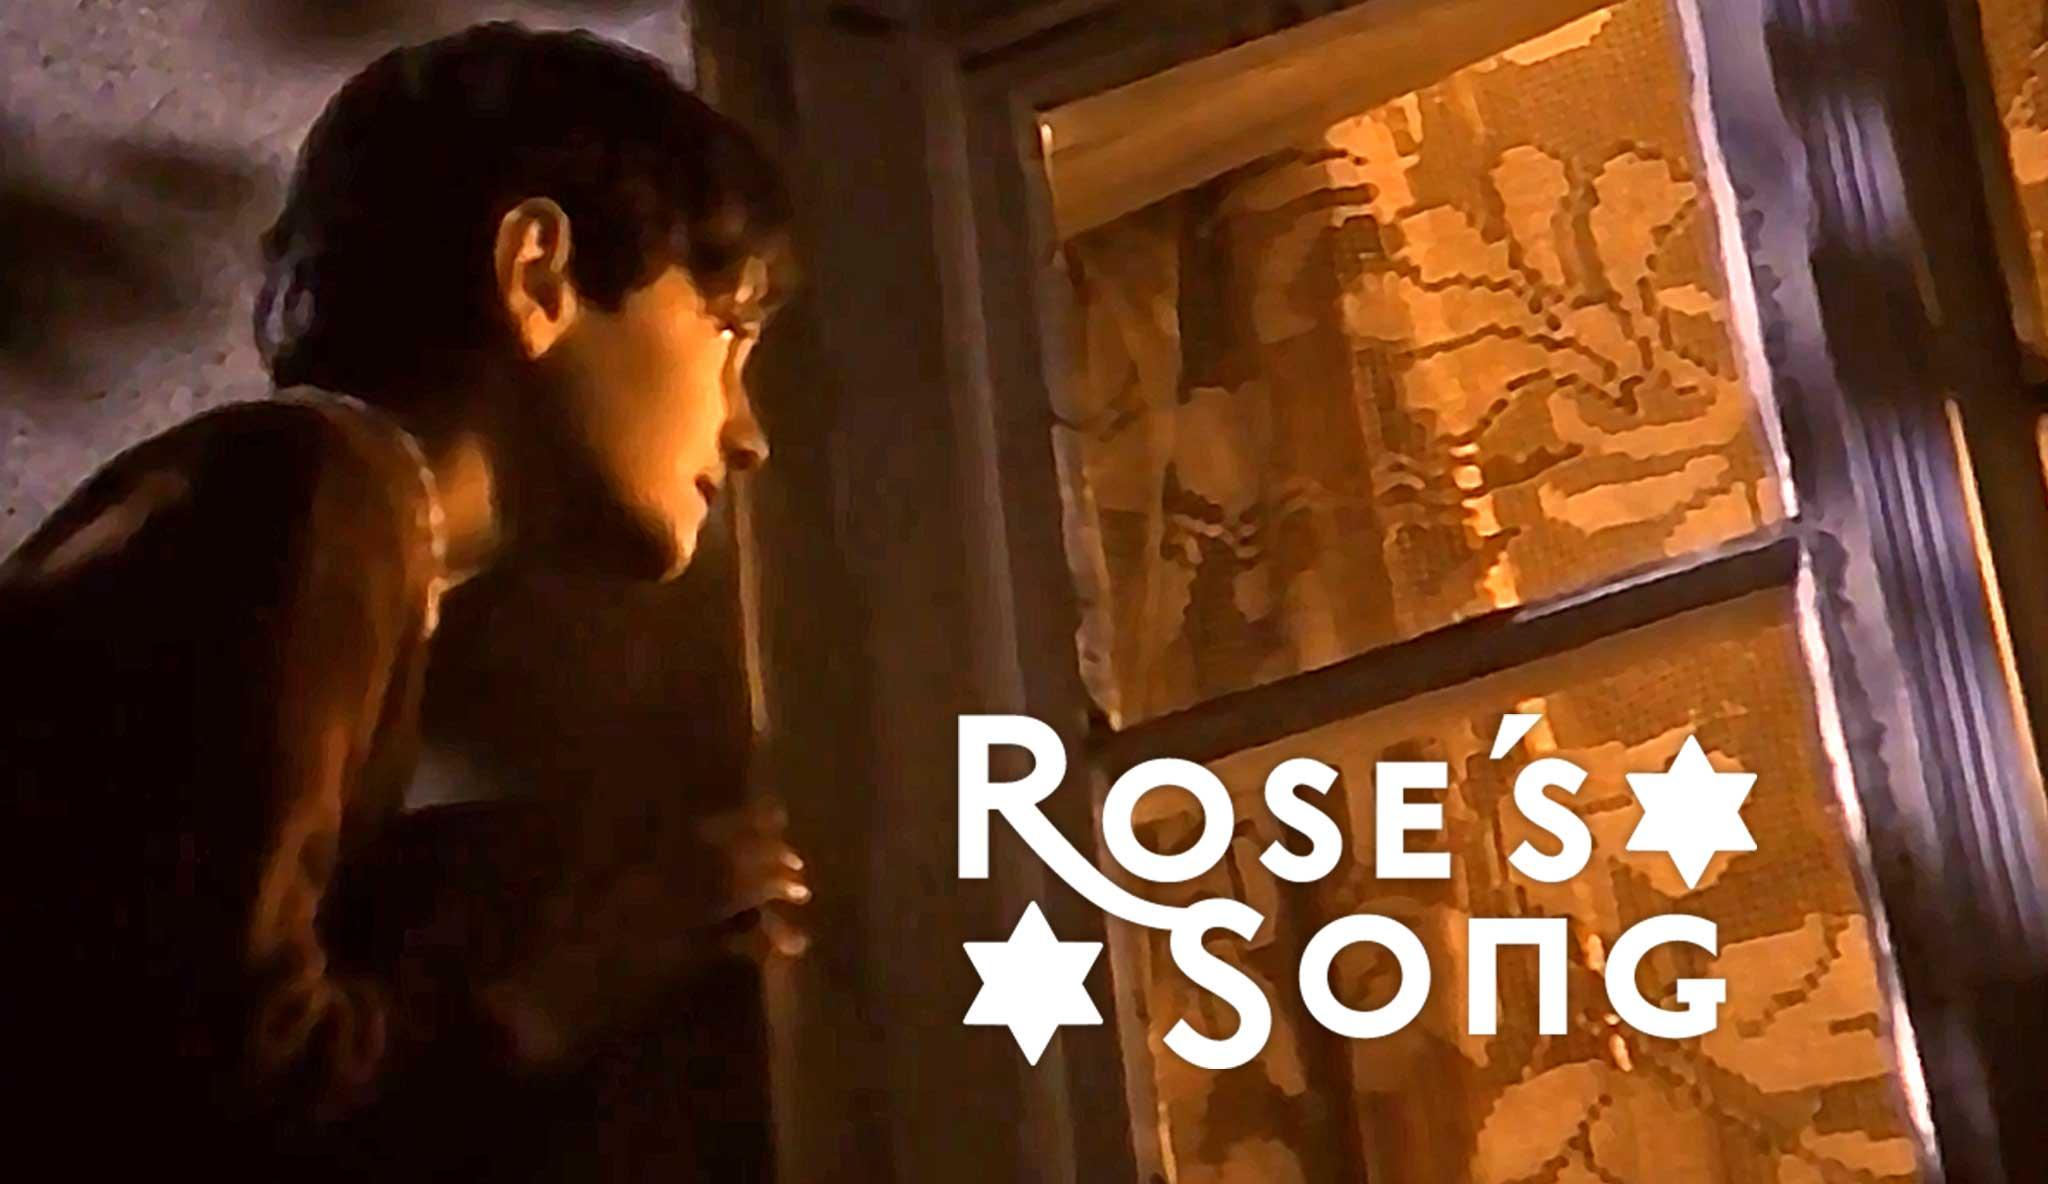 roses-song-glaube-und-hoffnung\header.jpg